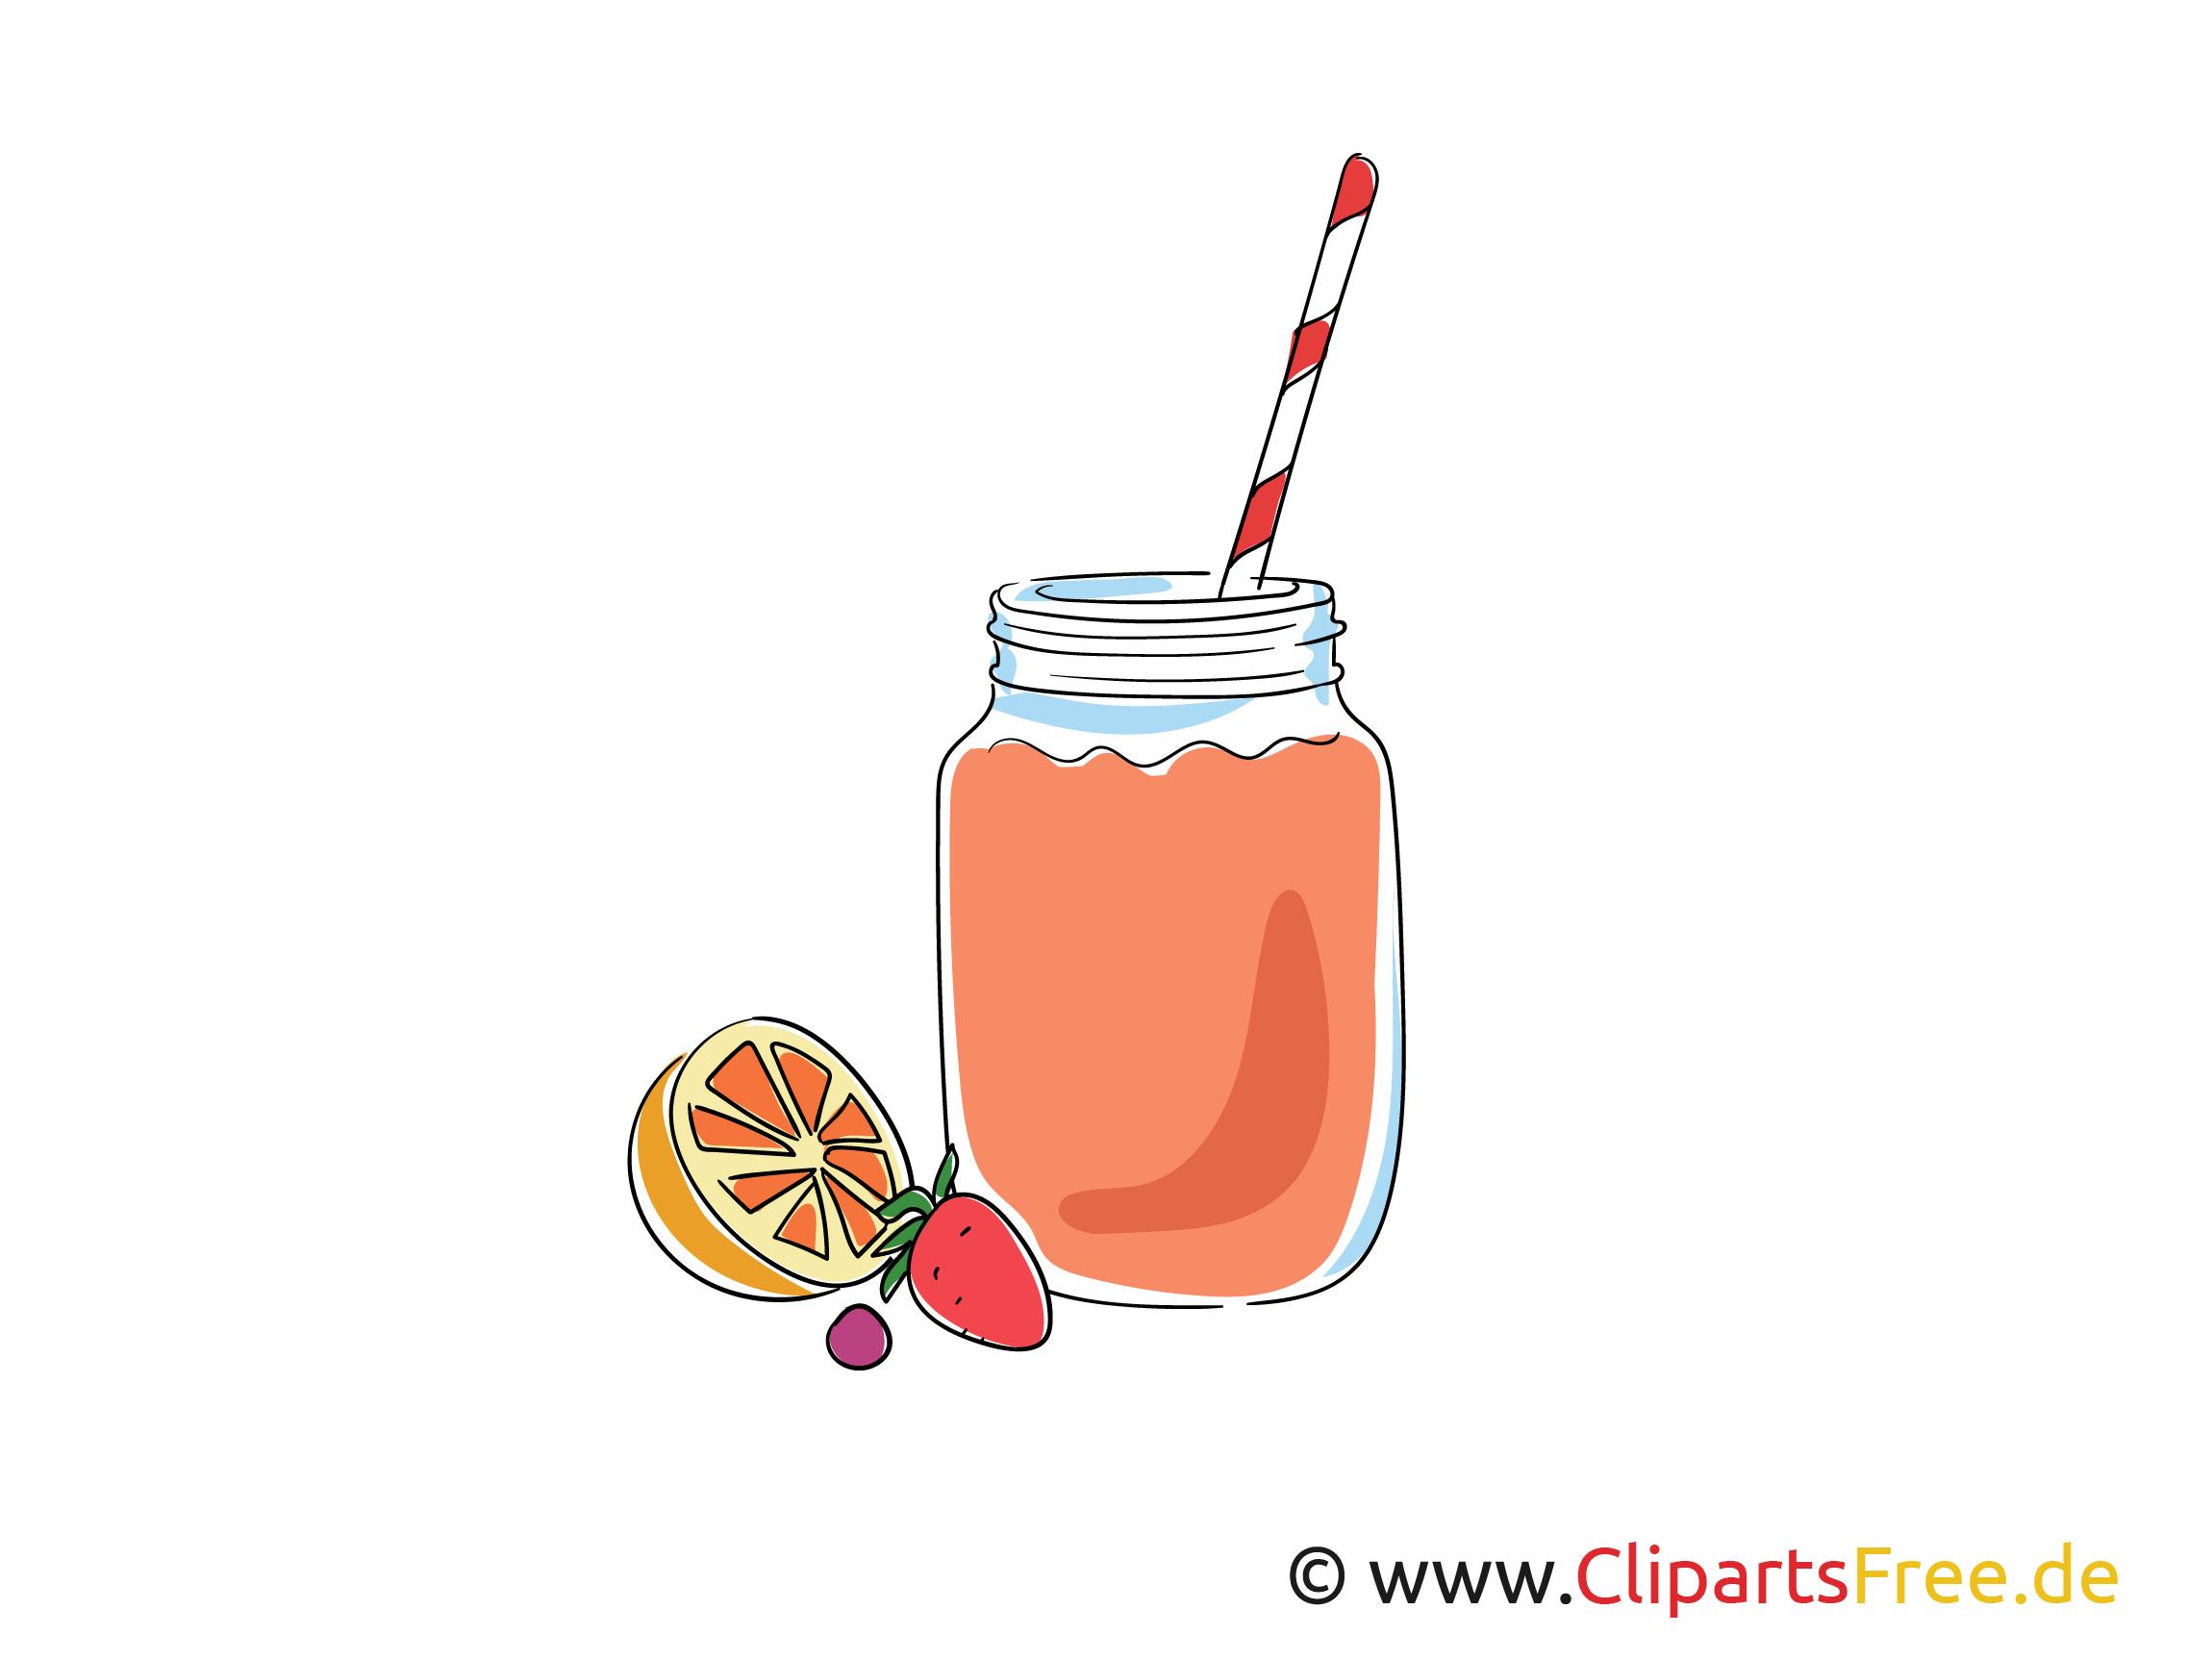 Marmelade, Konfitüre selbst gekocht Bilder, Cliparts